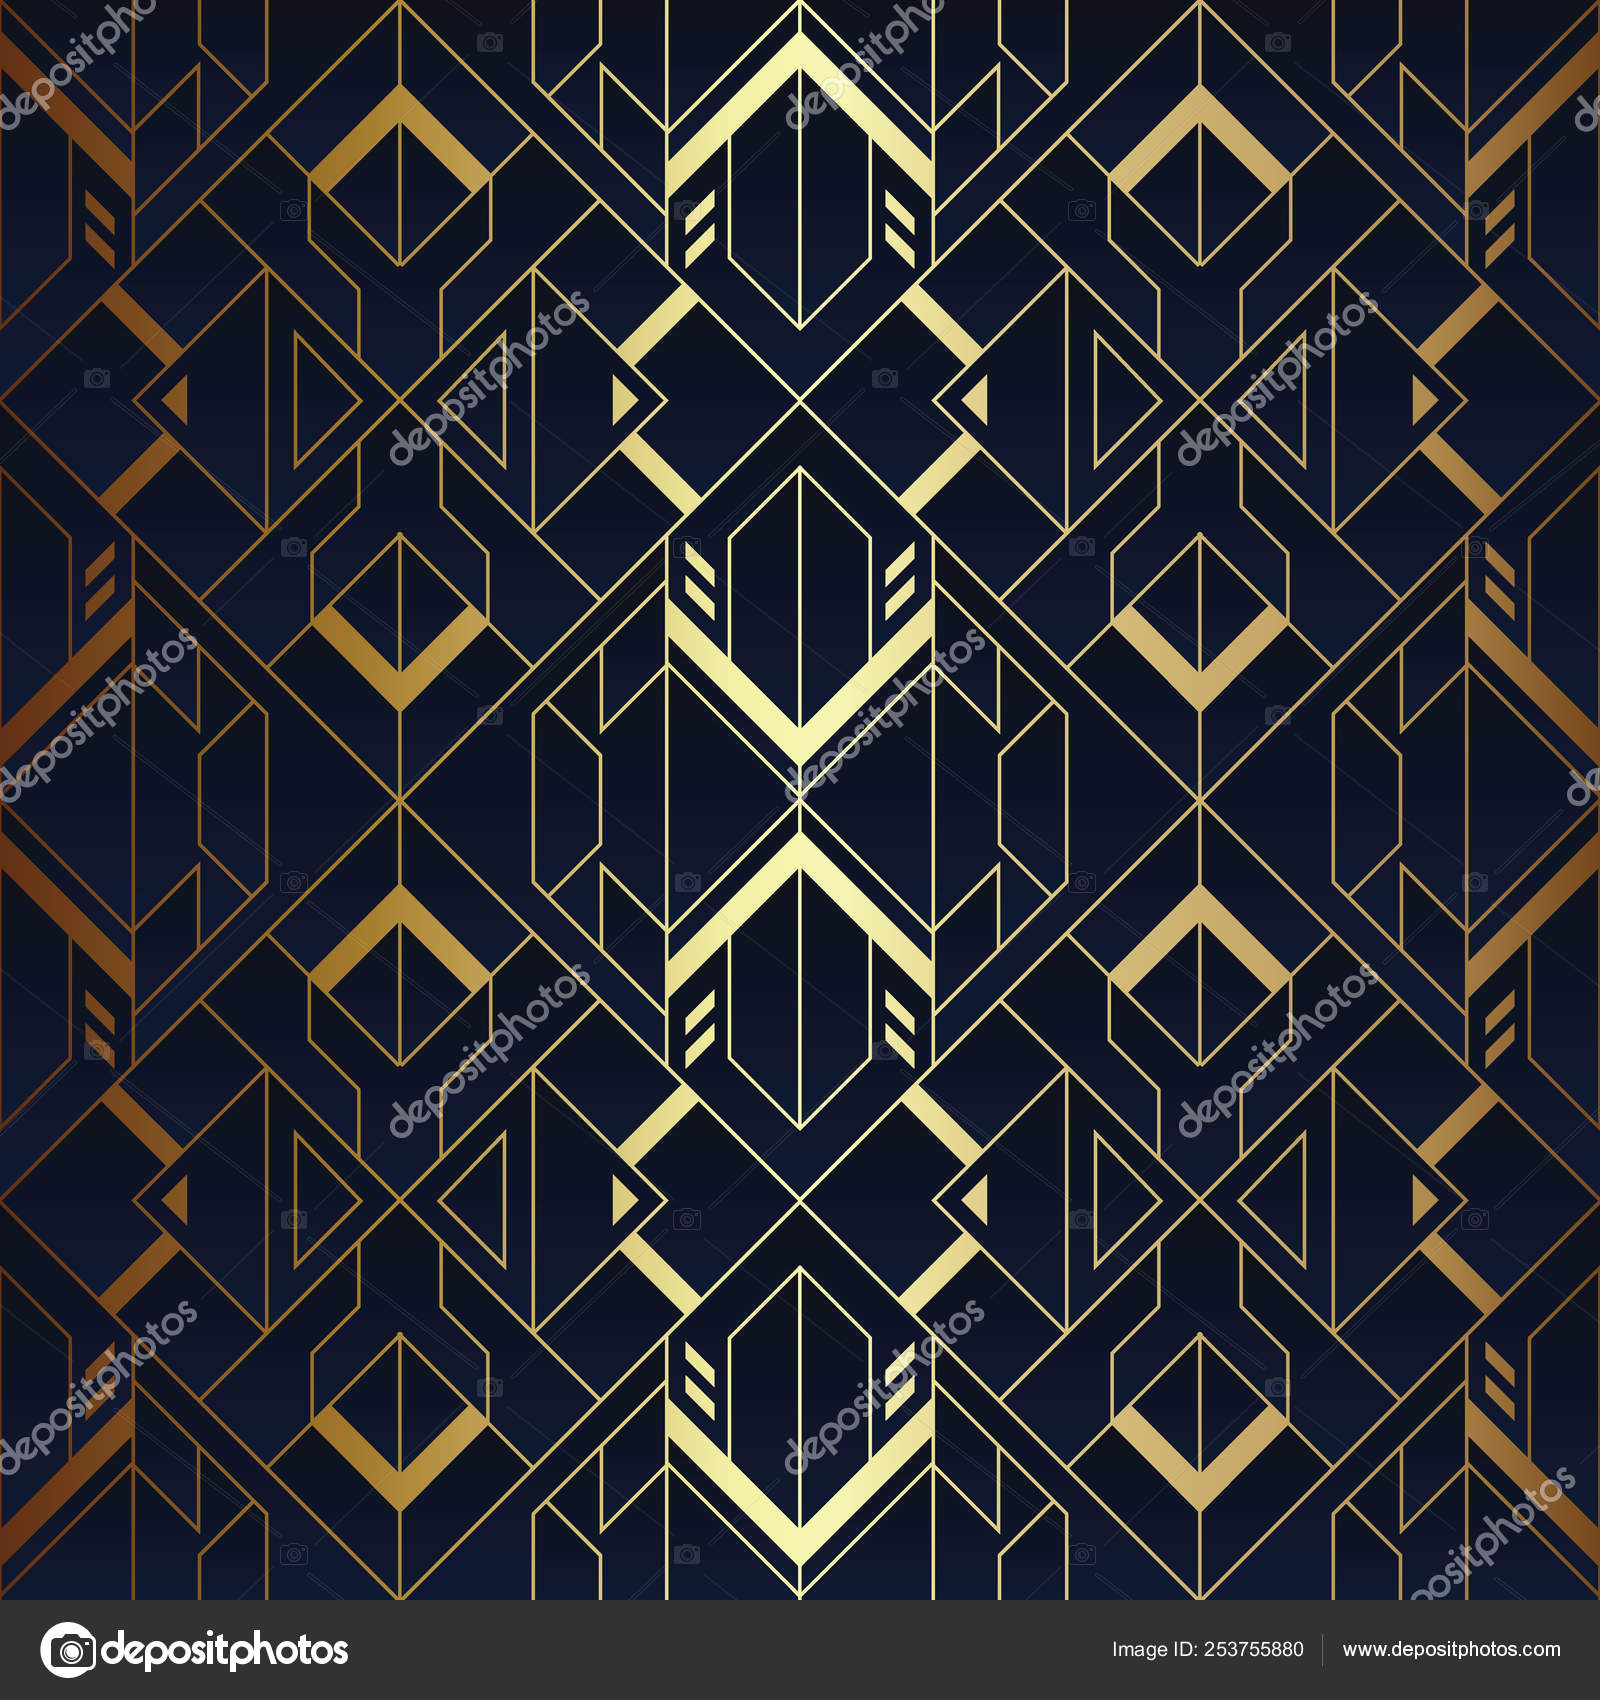 Abstract Art Luxury Dark Seamless Blue And Golden Pattern